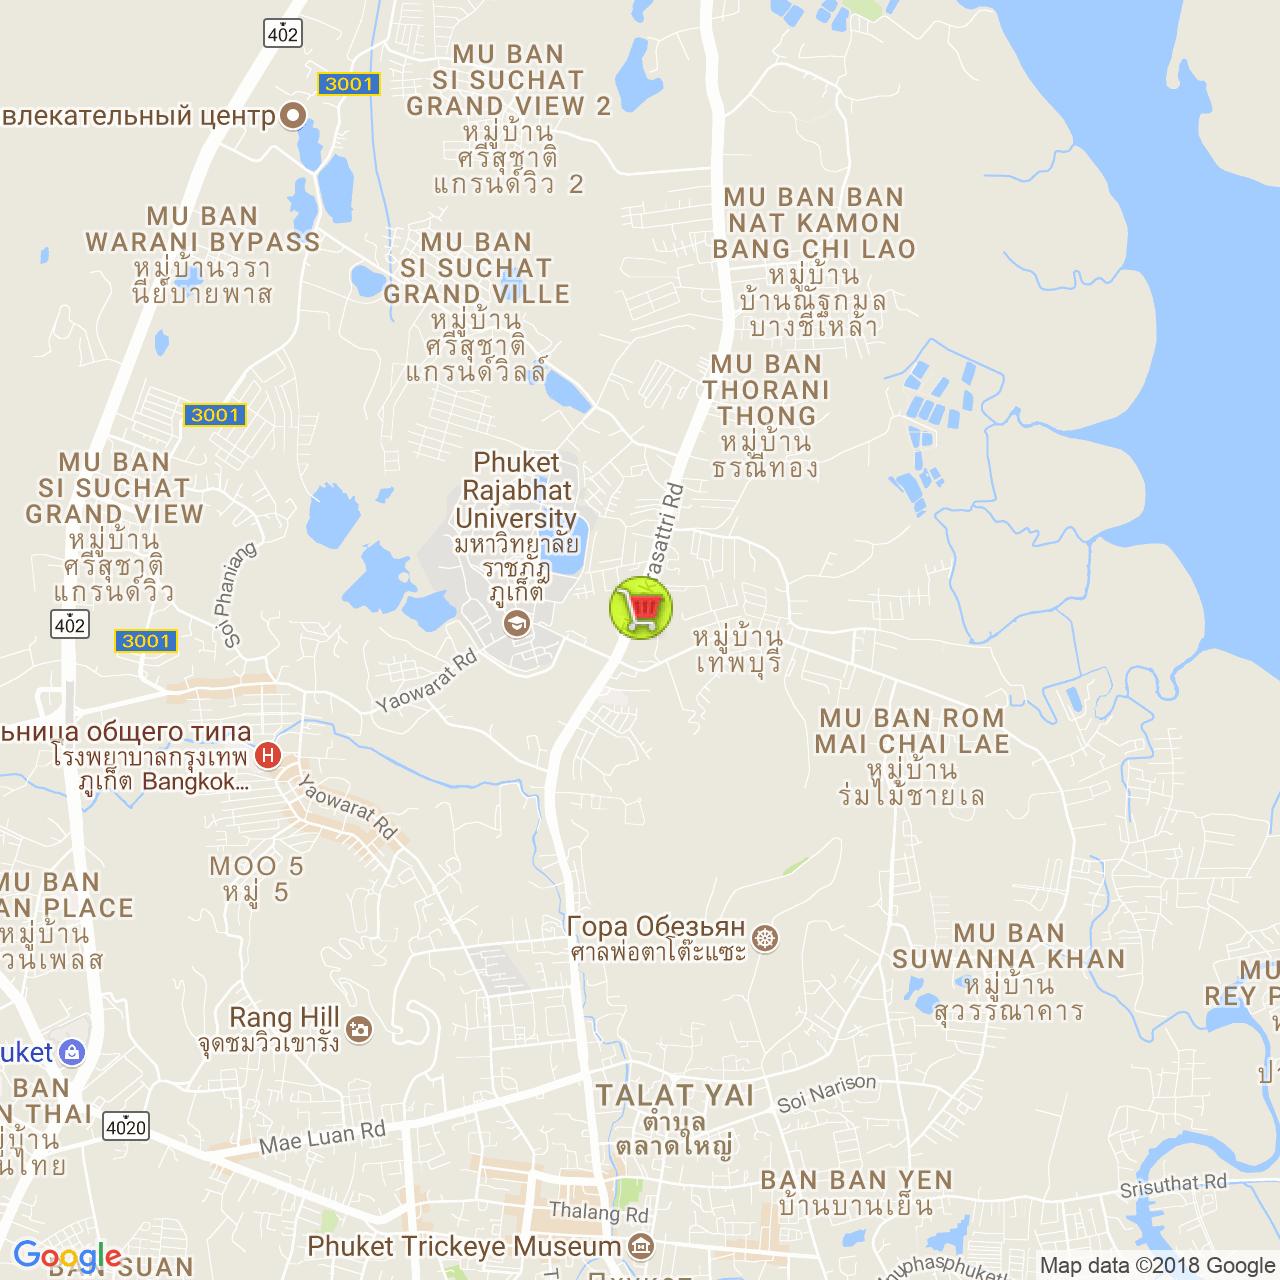 Big С Market @ Пхукет таун на карте Пхукета